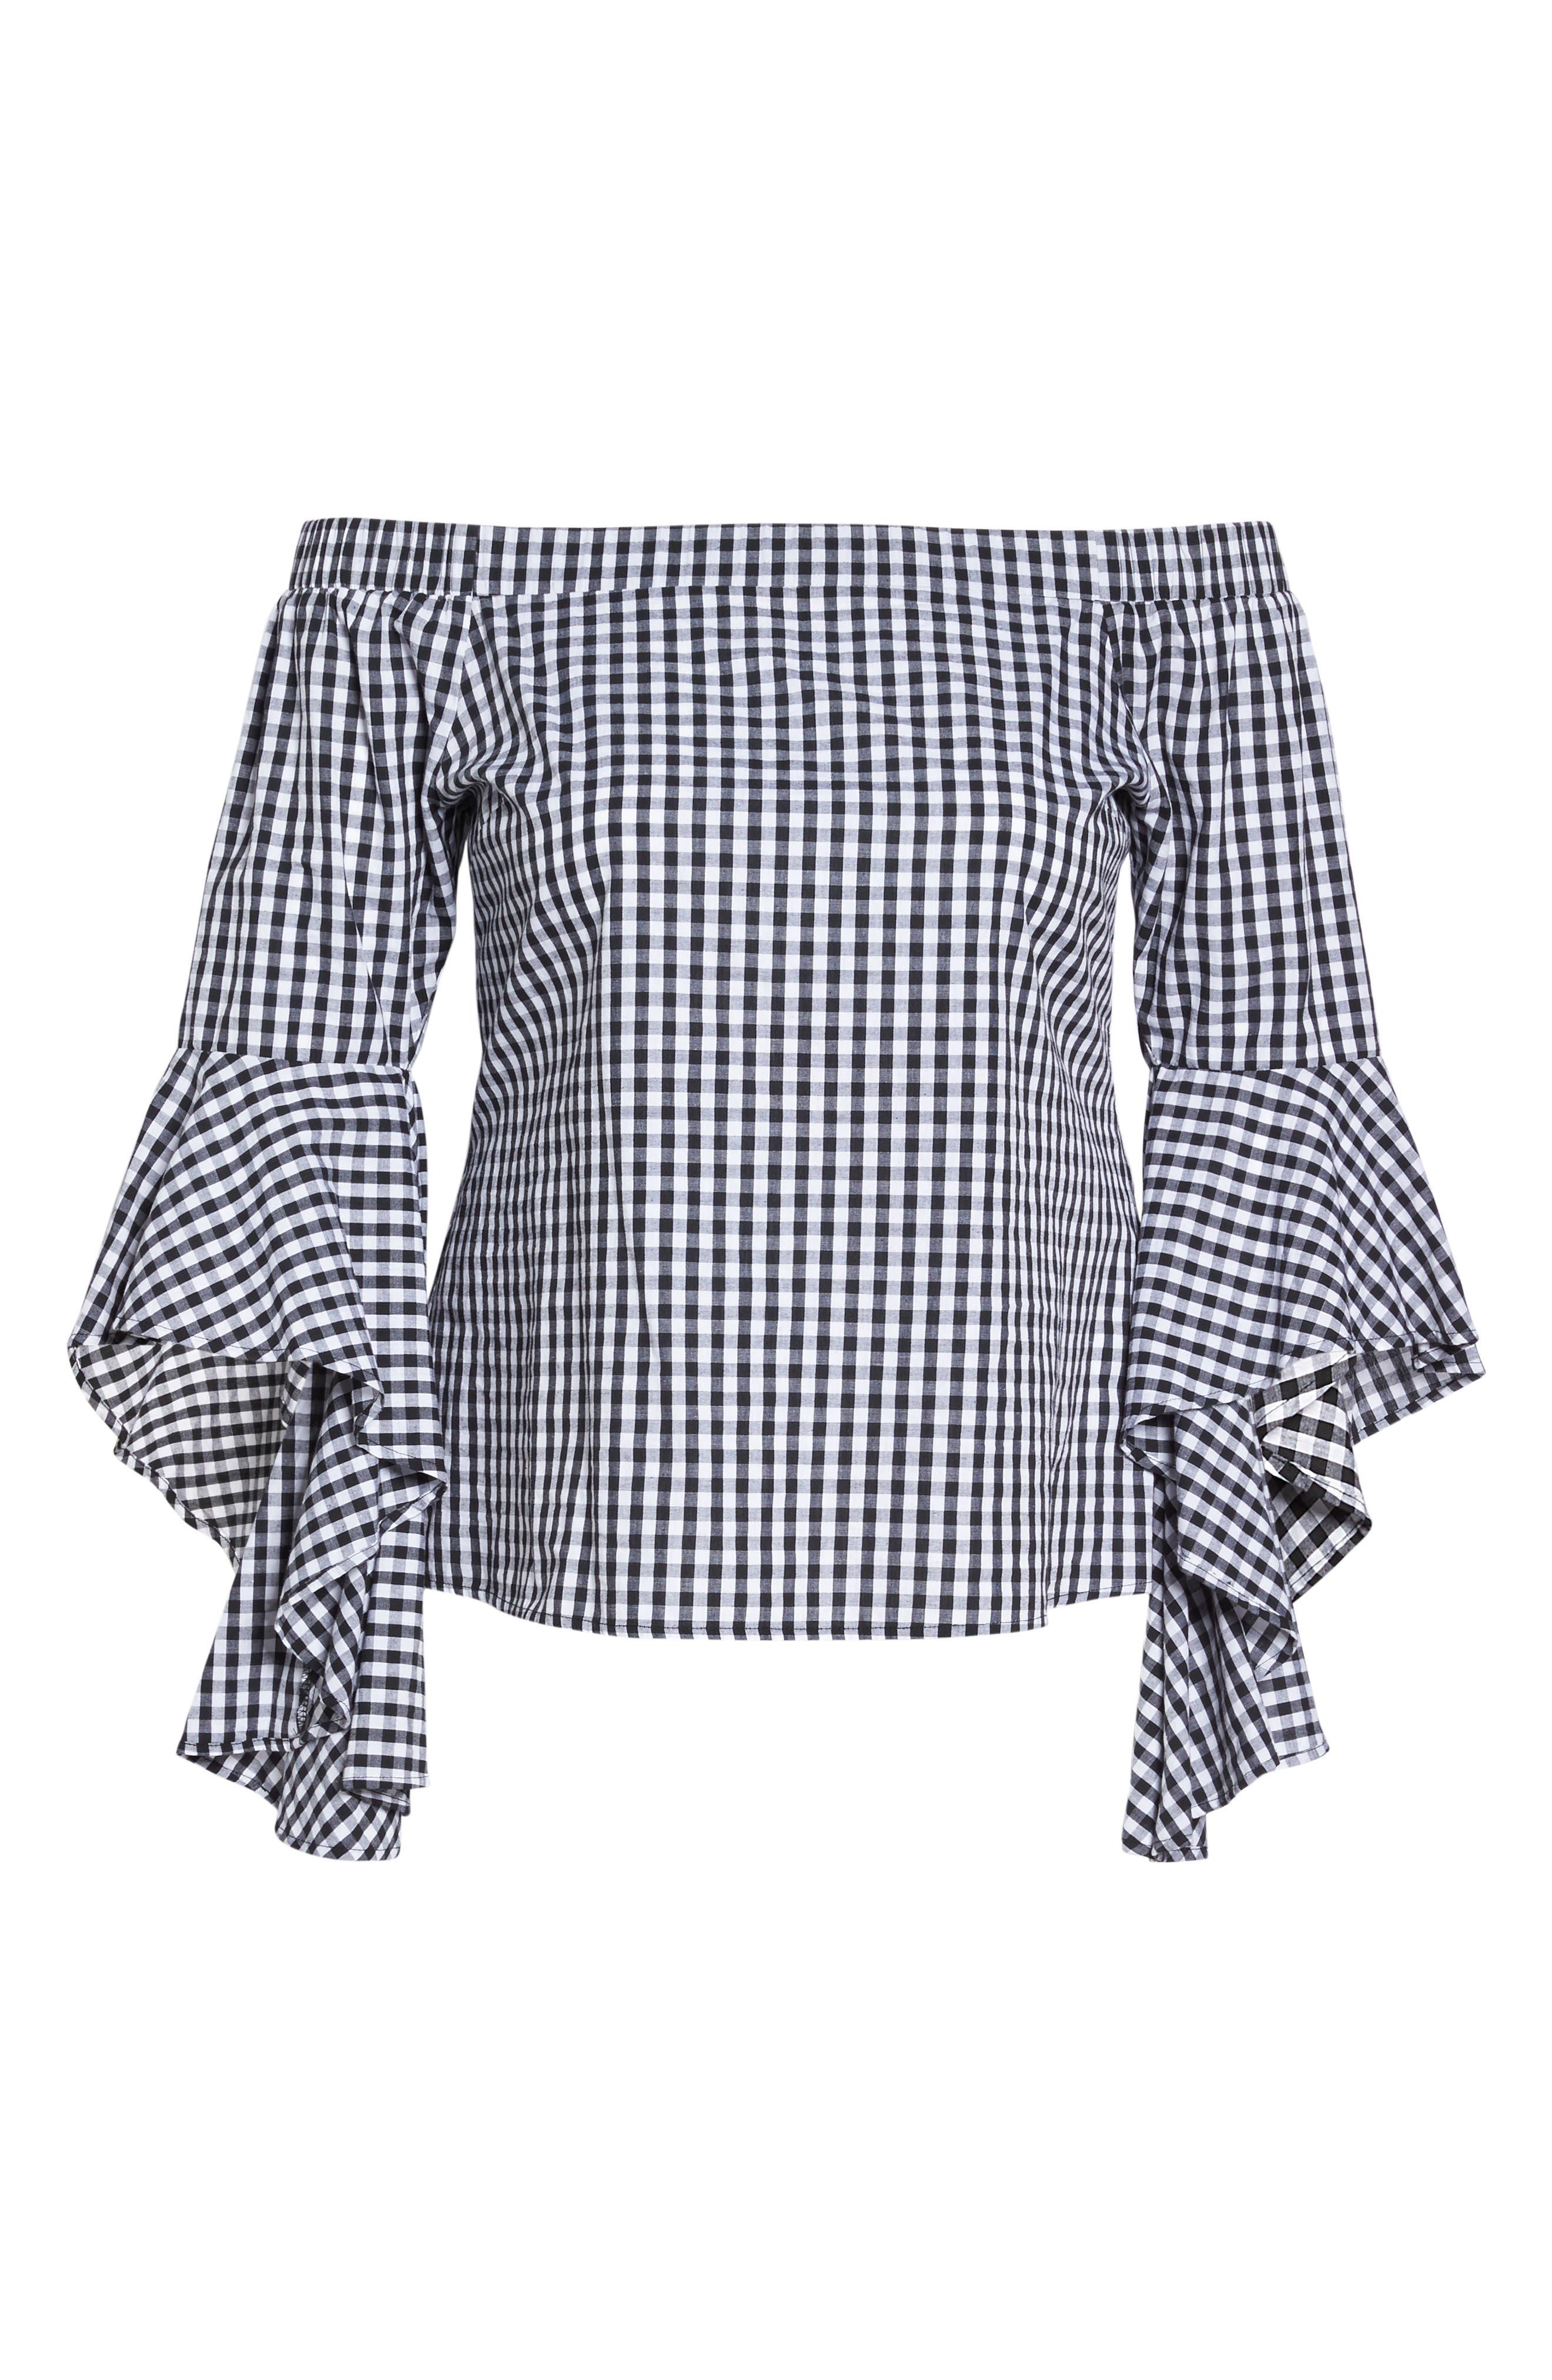 Bell Sleeve Off the Shoulder Shirt,                             Alternate thumbnail 7, color,                             Black / White